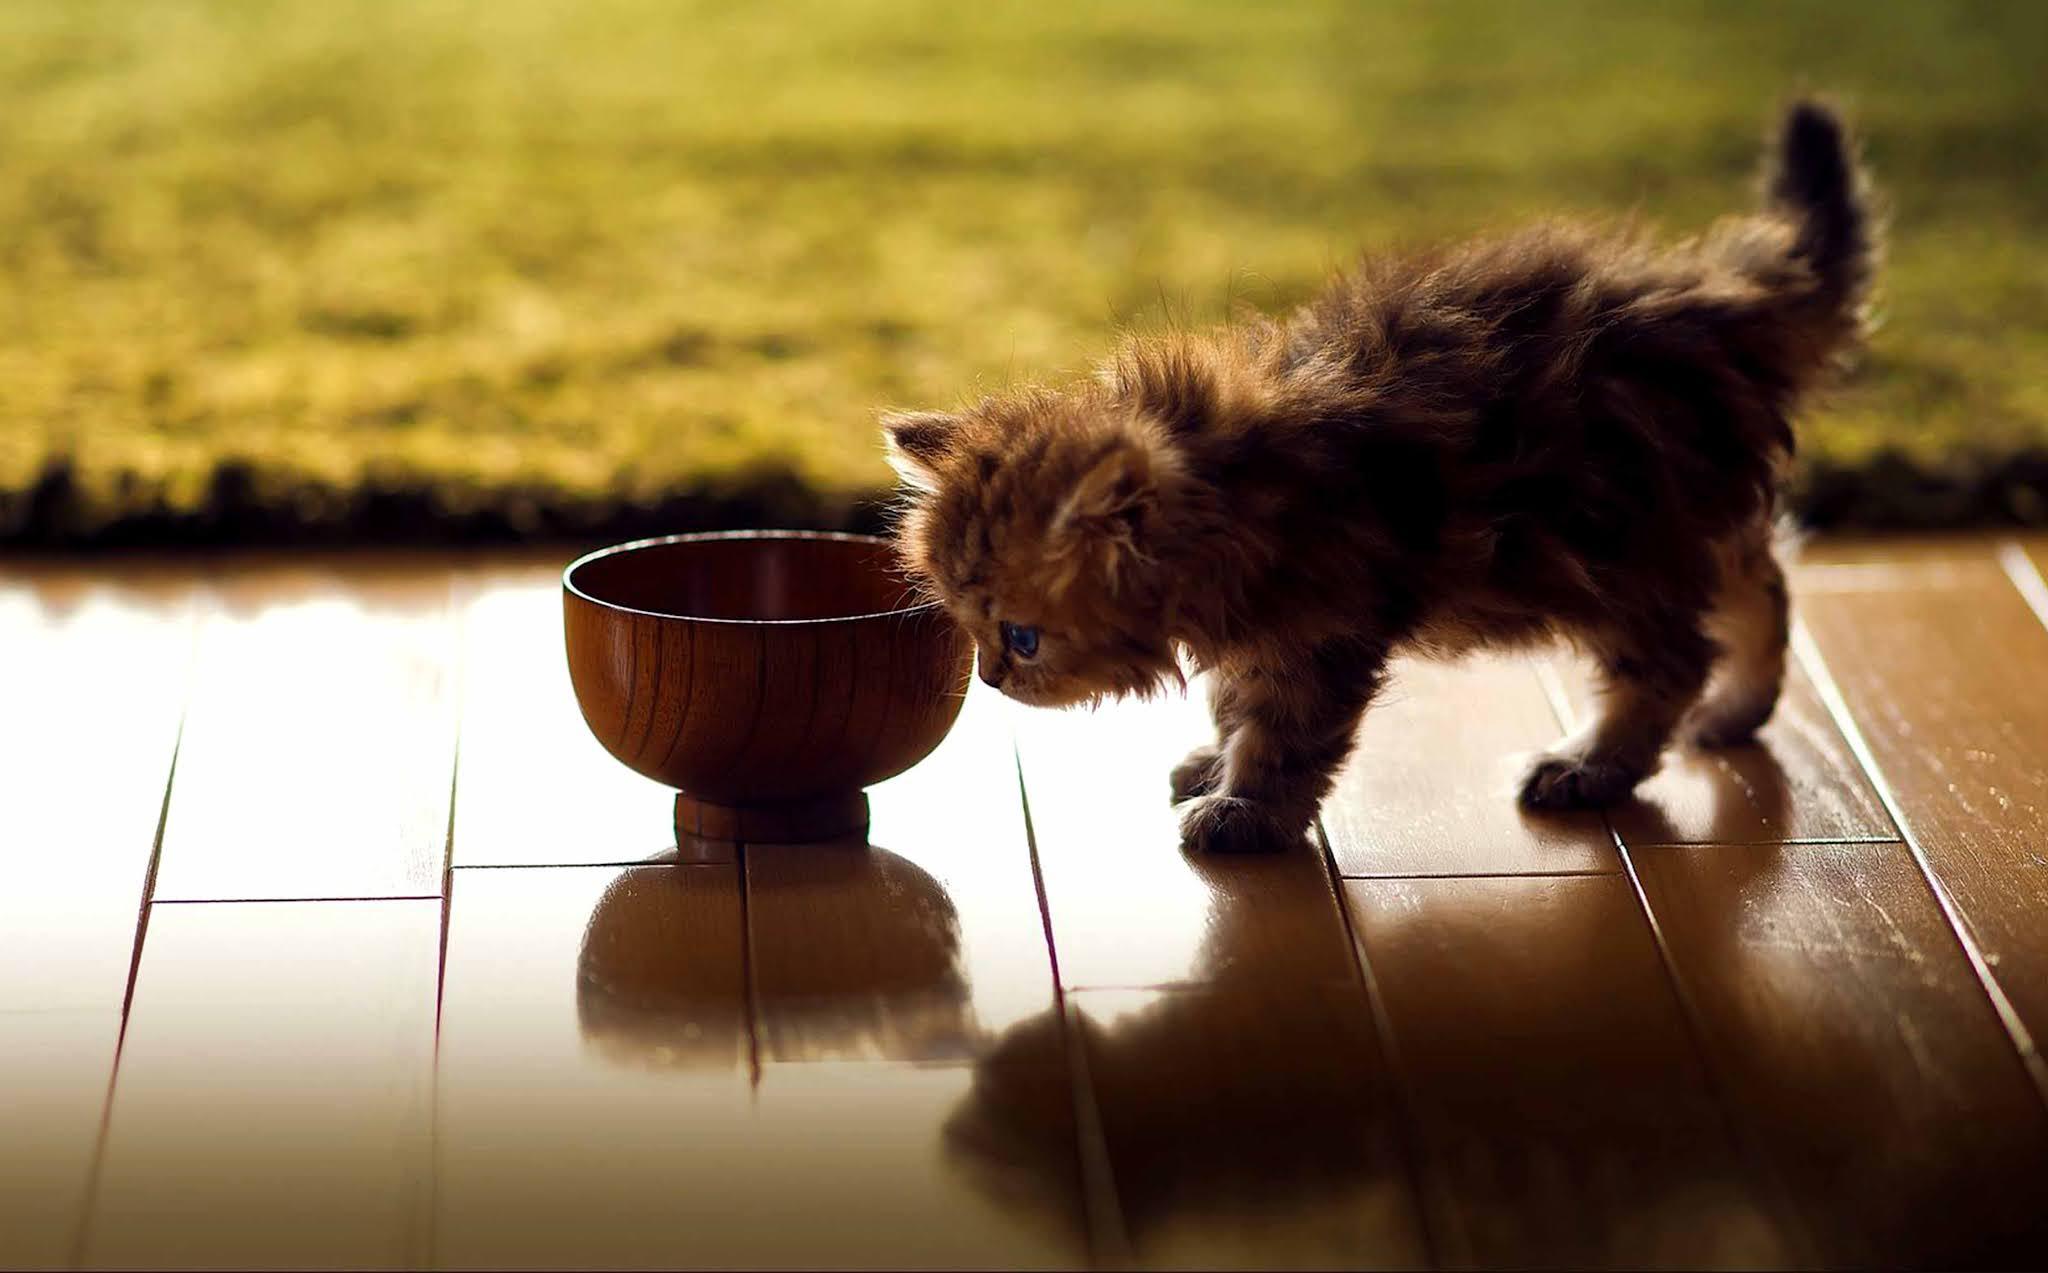 21 wallpaper image kitten, cat, animal, cute wallpaper, background Ultra HD 4K 5K 8K for Computer Desktop